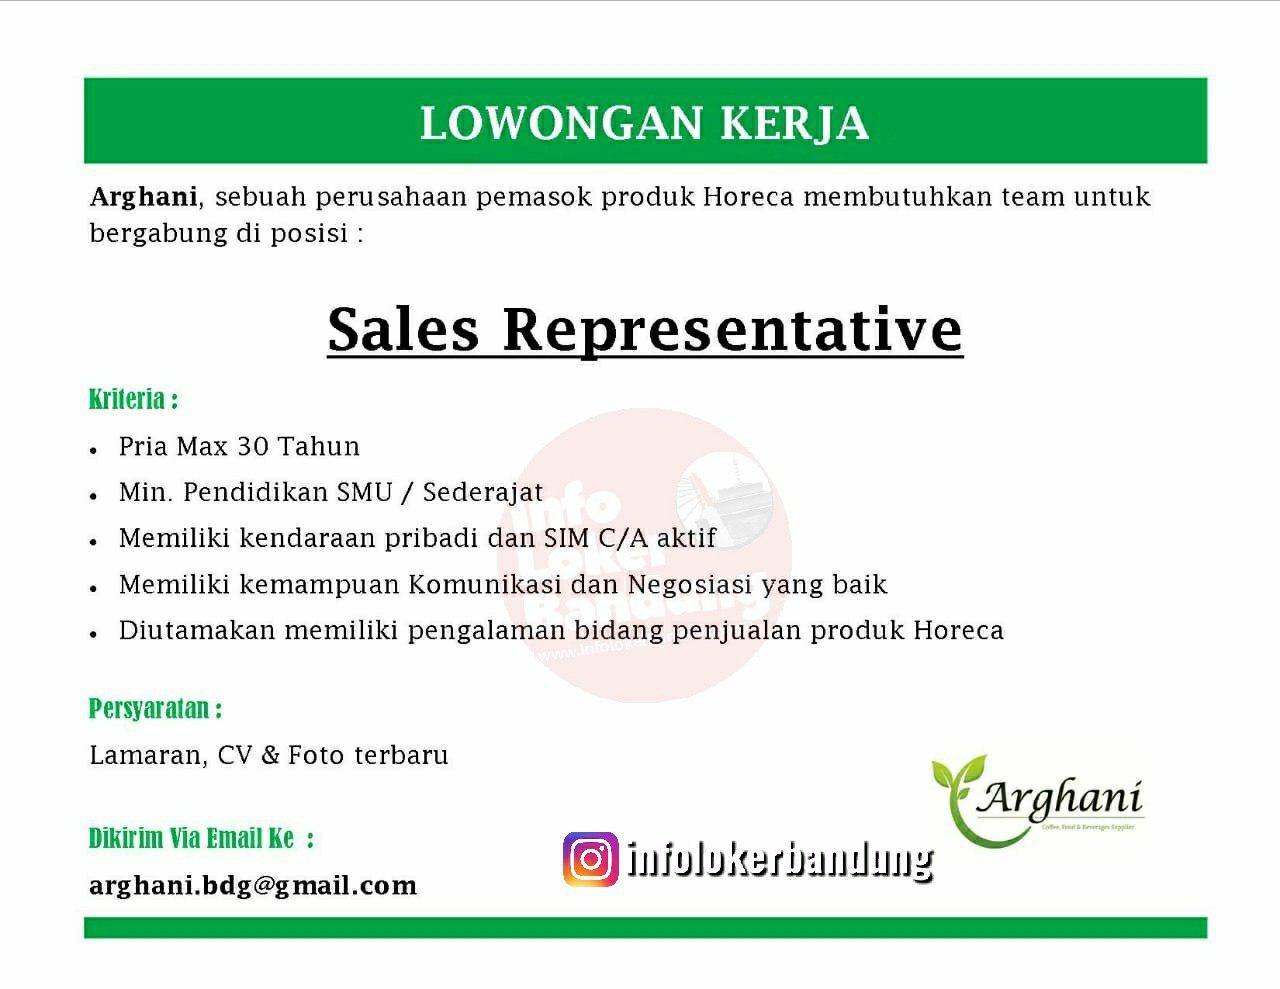 Lowongan Kerja Sales Representative Arghani Bandung Mei 2019